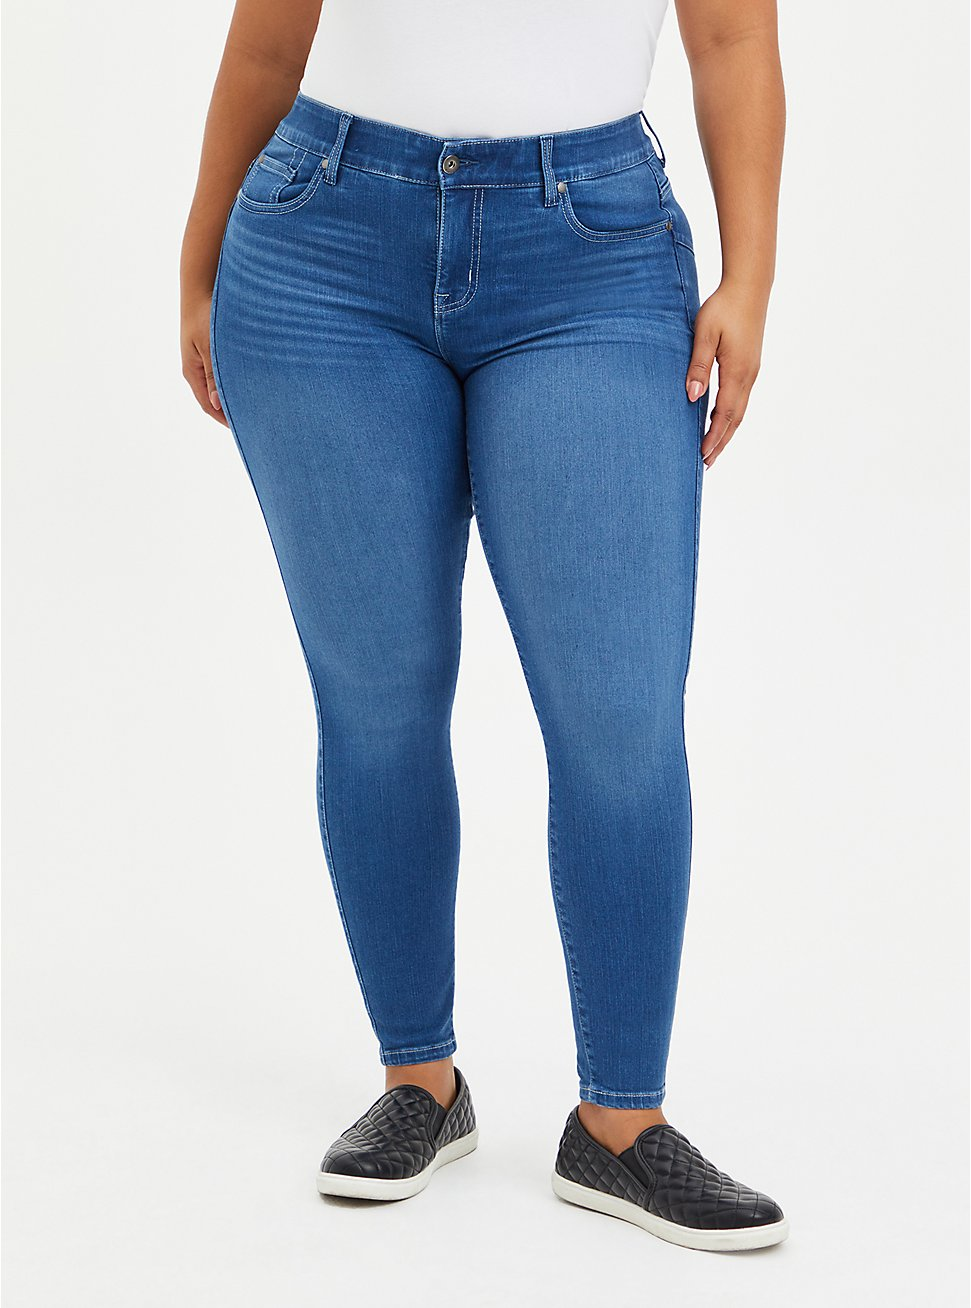 Bombshell Skinny Jean - Premium Stretch Eco Medium Wash, CHELSEA, hi-res